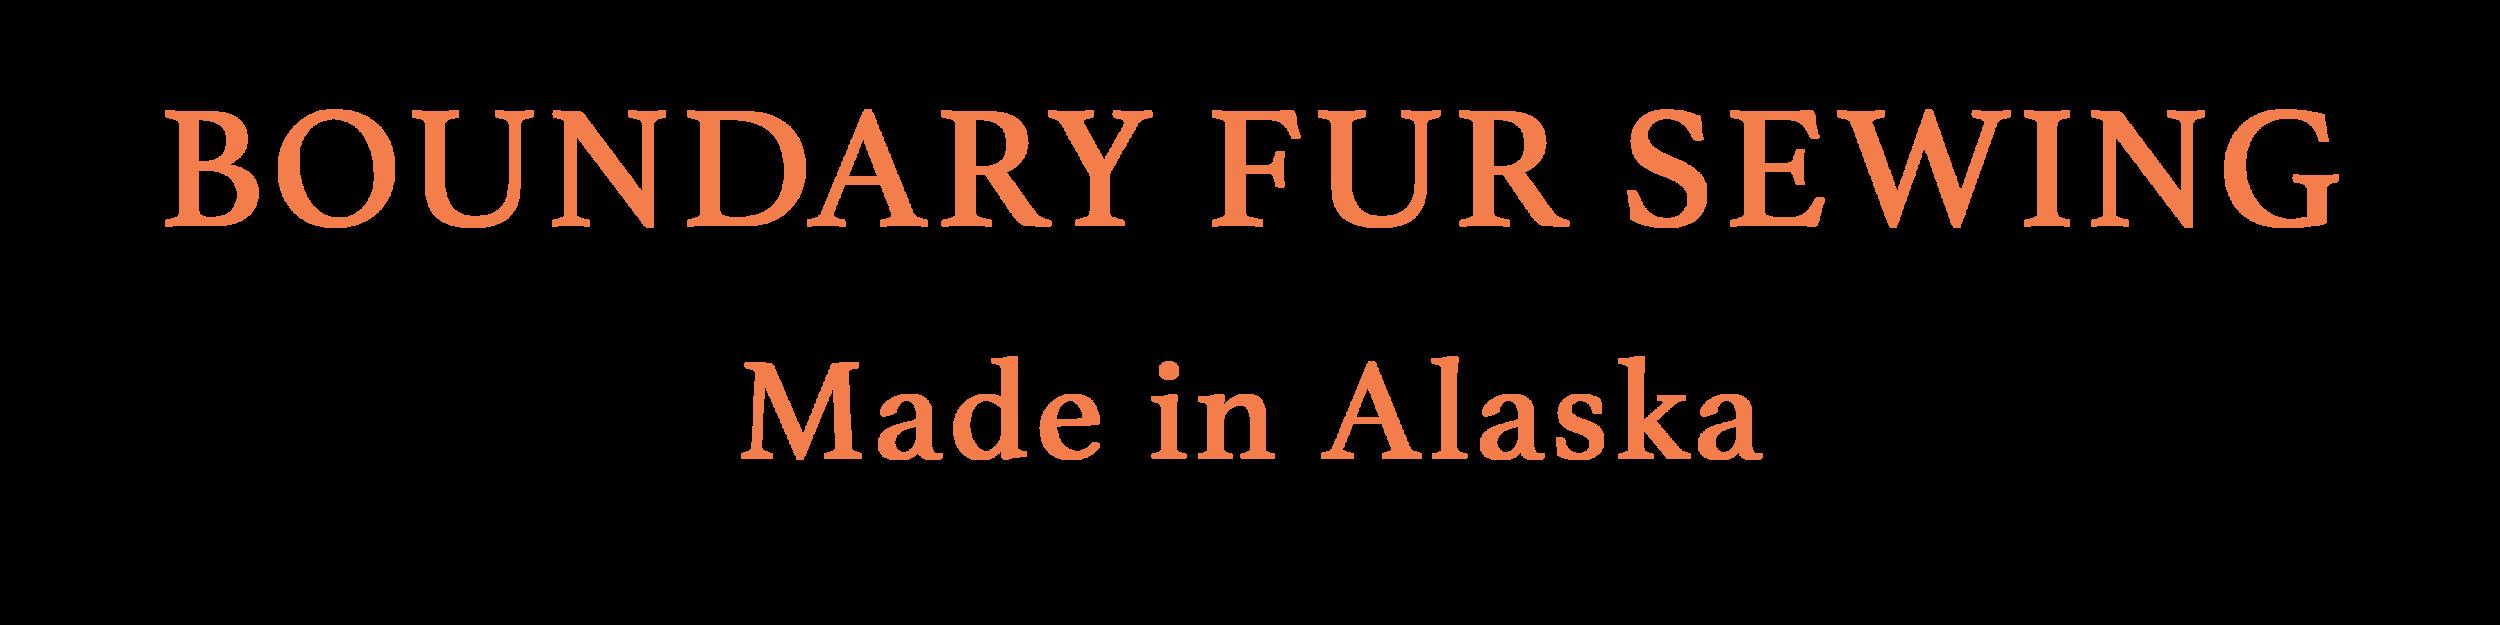 BFS made in alaska | 2.png